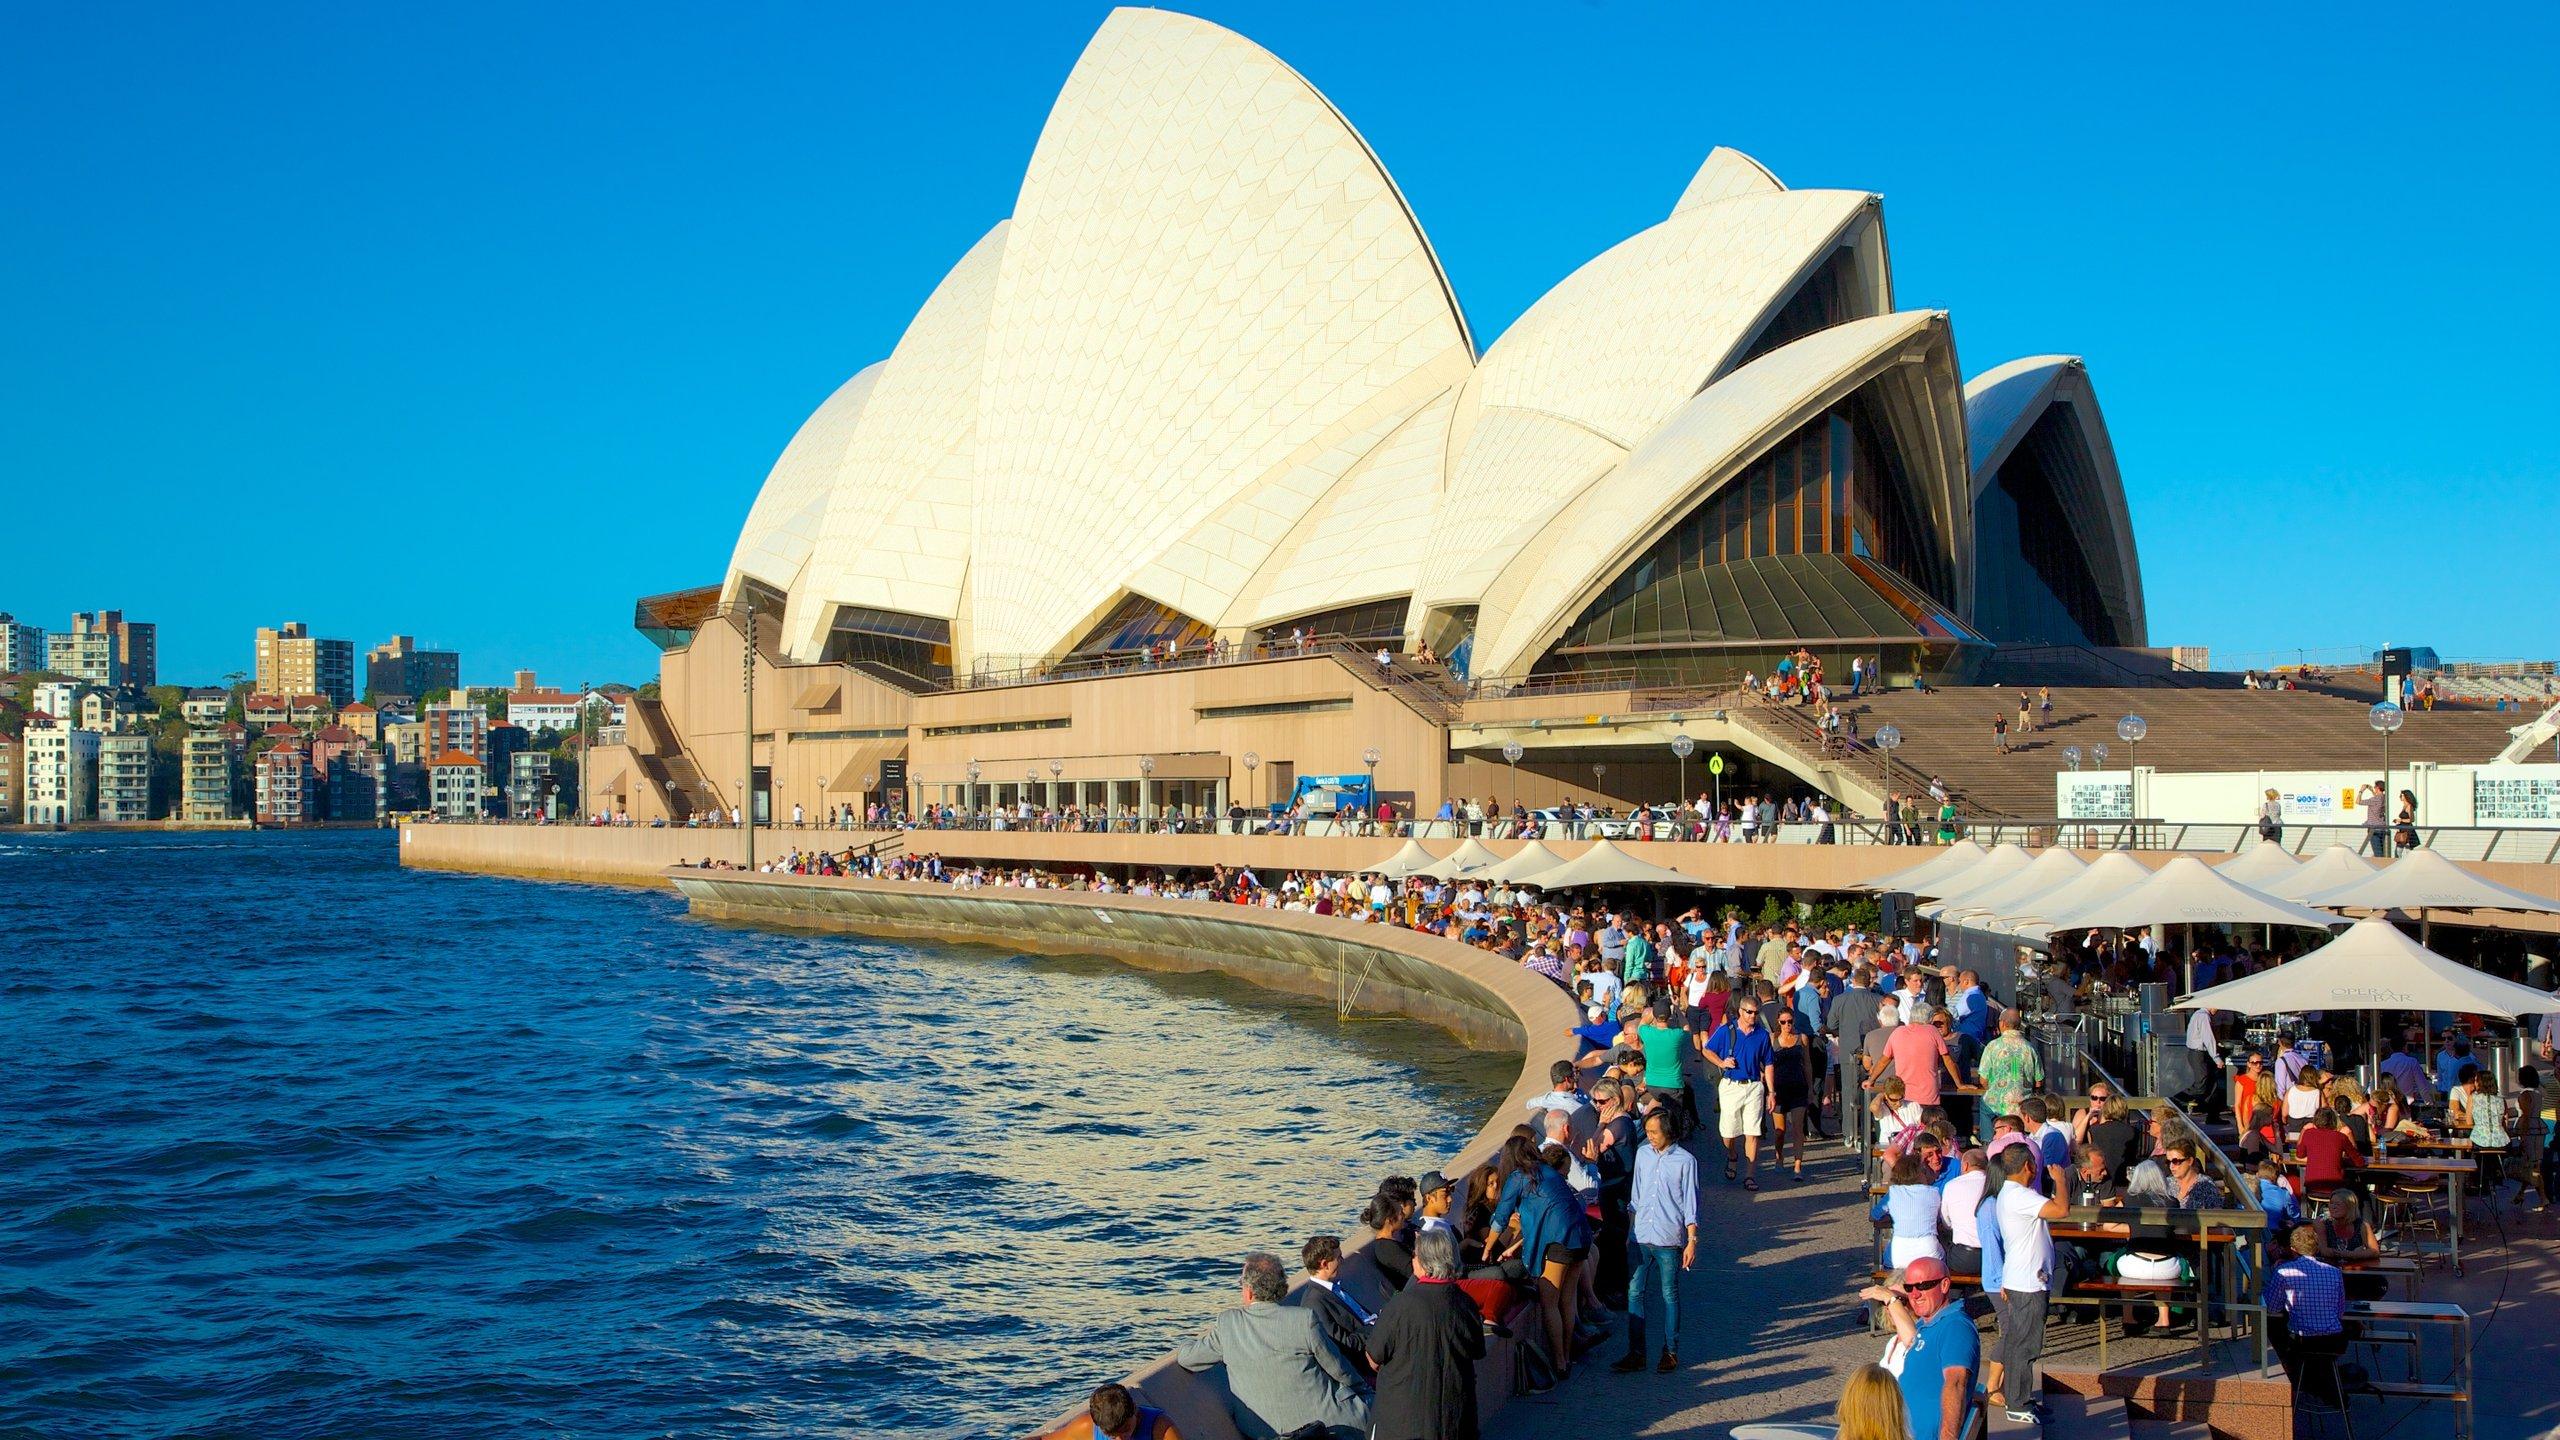 East Sydney, New South Wales, Australia